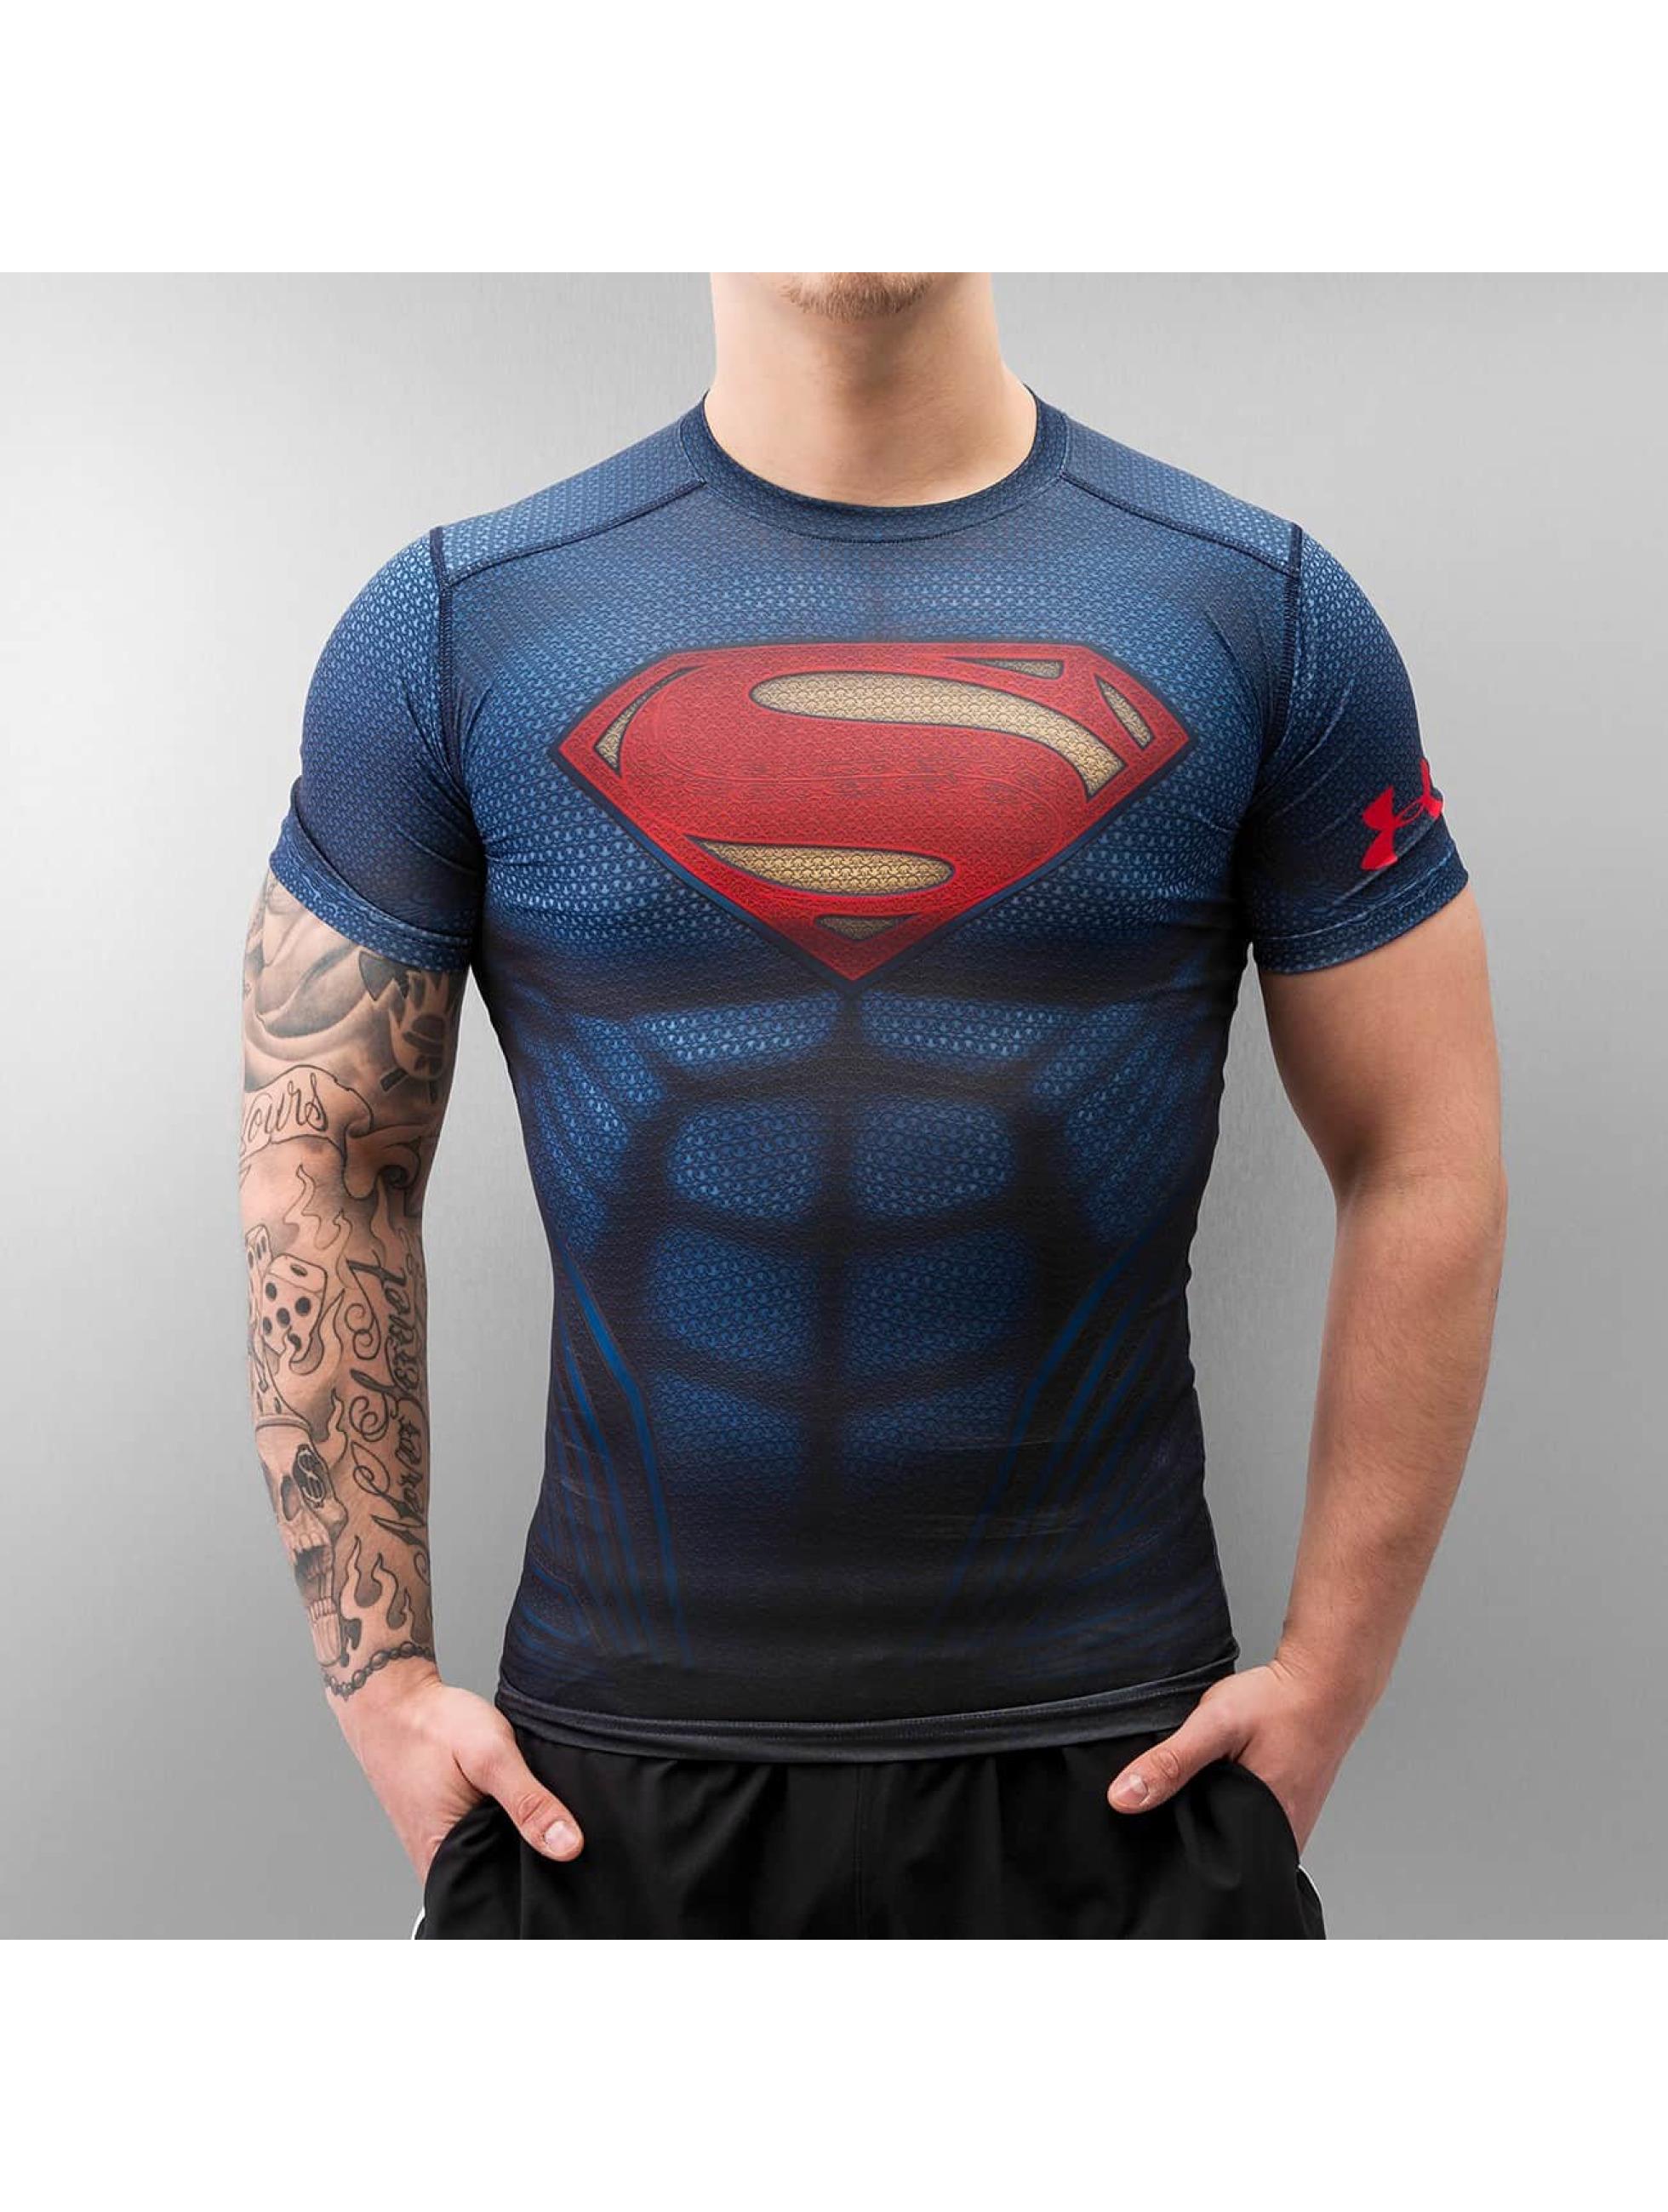 Under armour bovenstuk t shirt alter ego superman in for Original under armour shirt